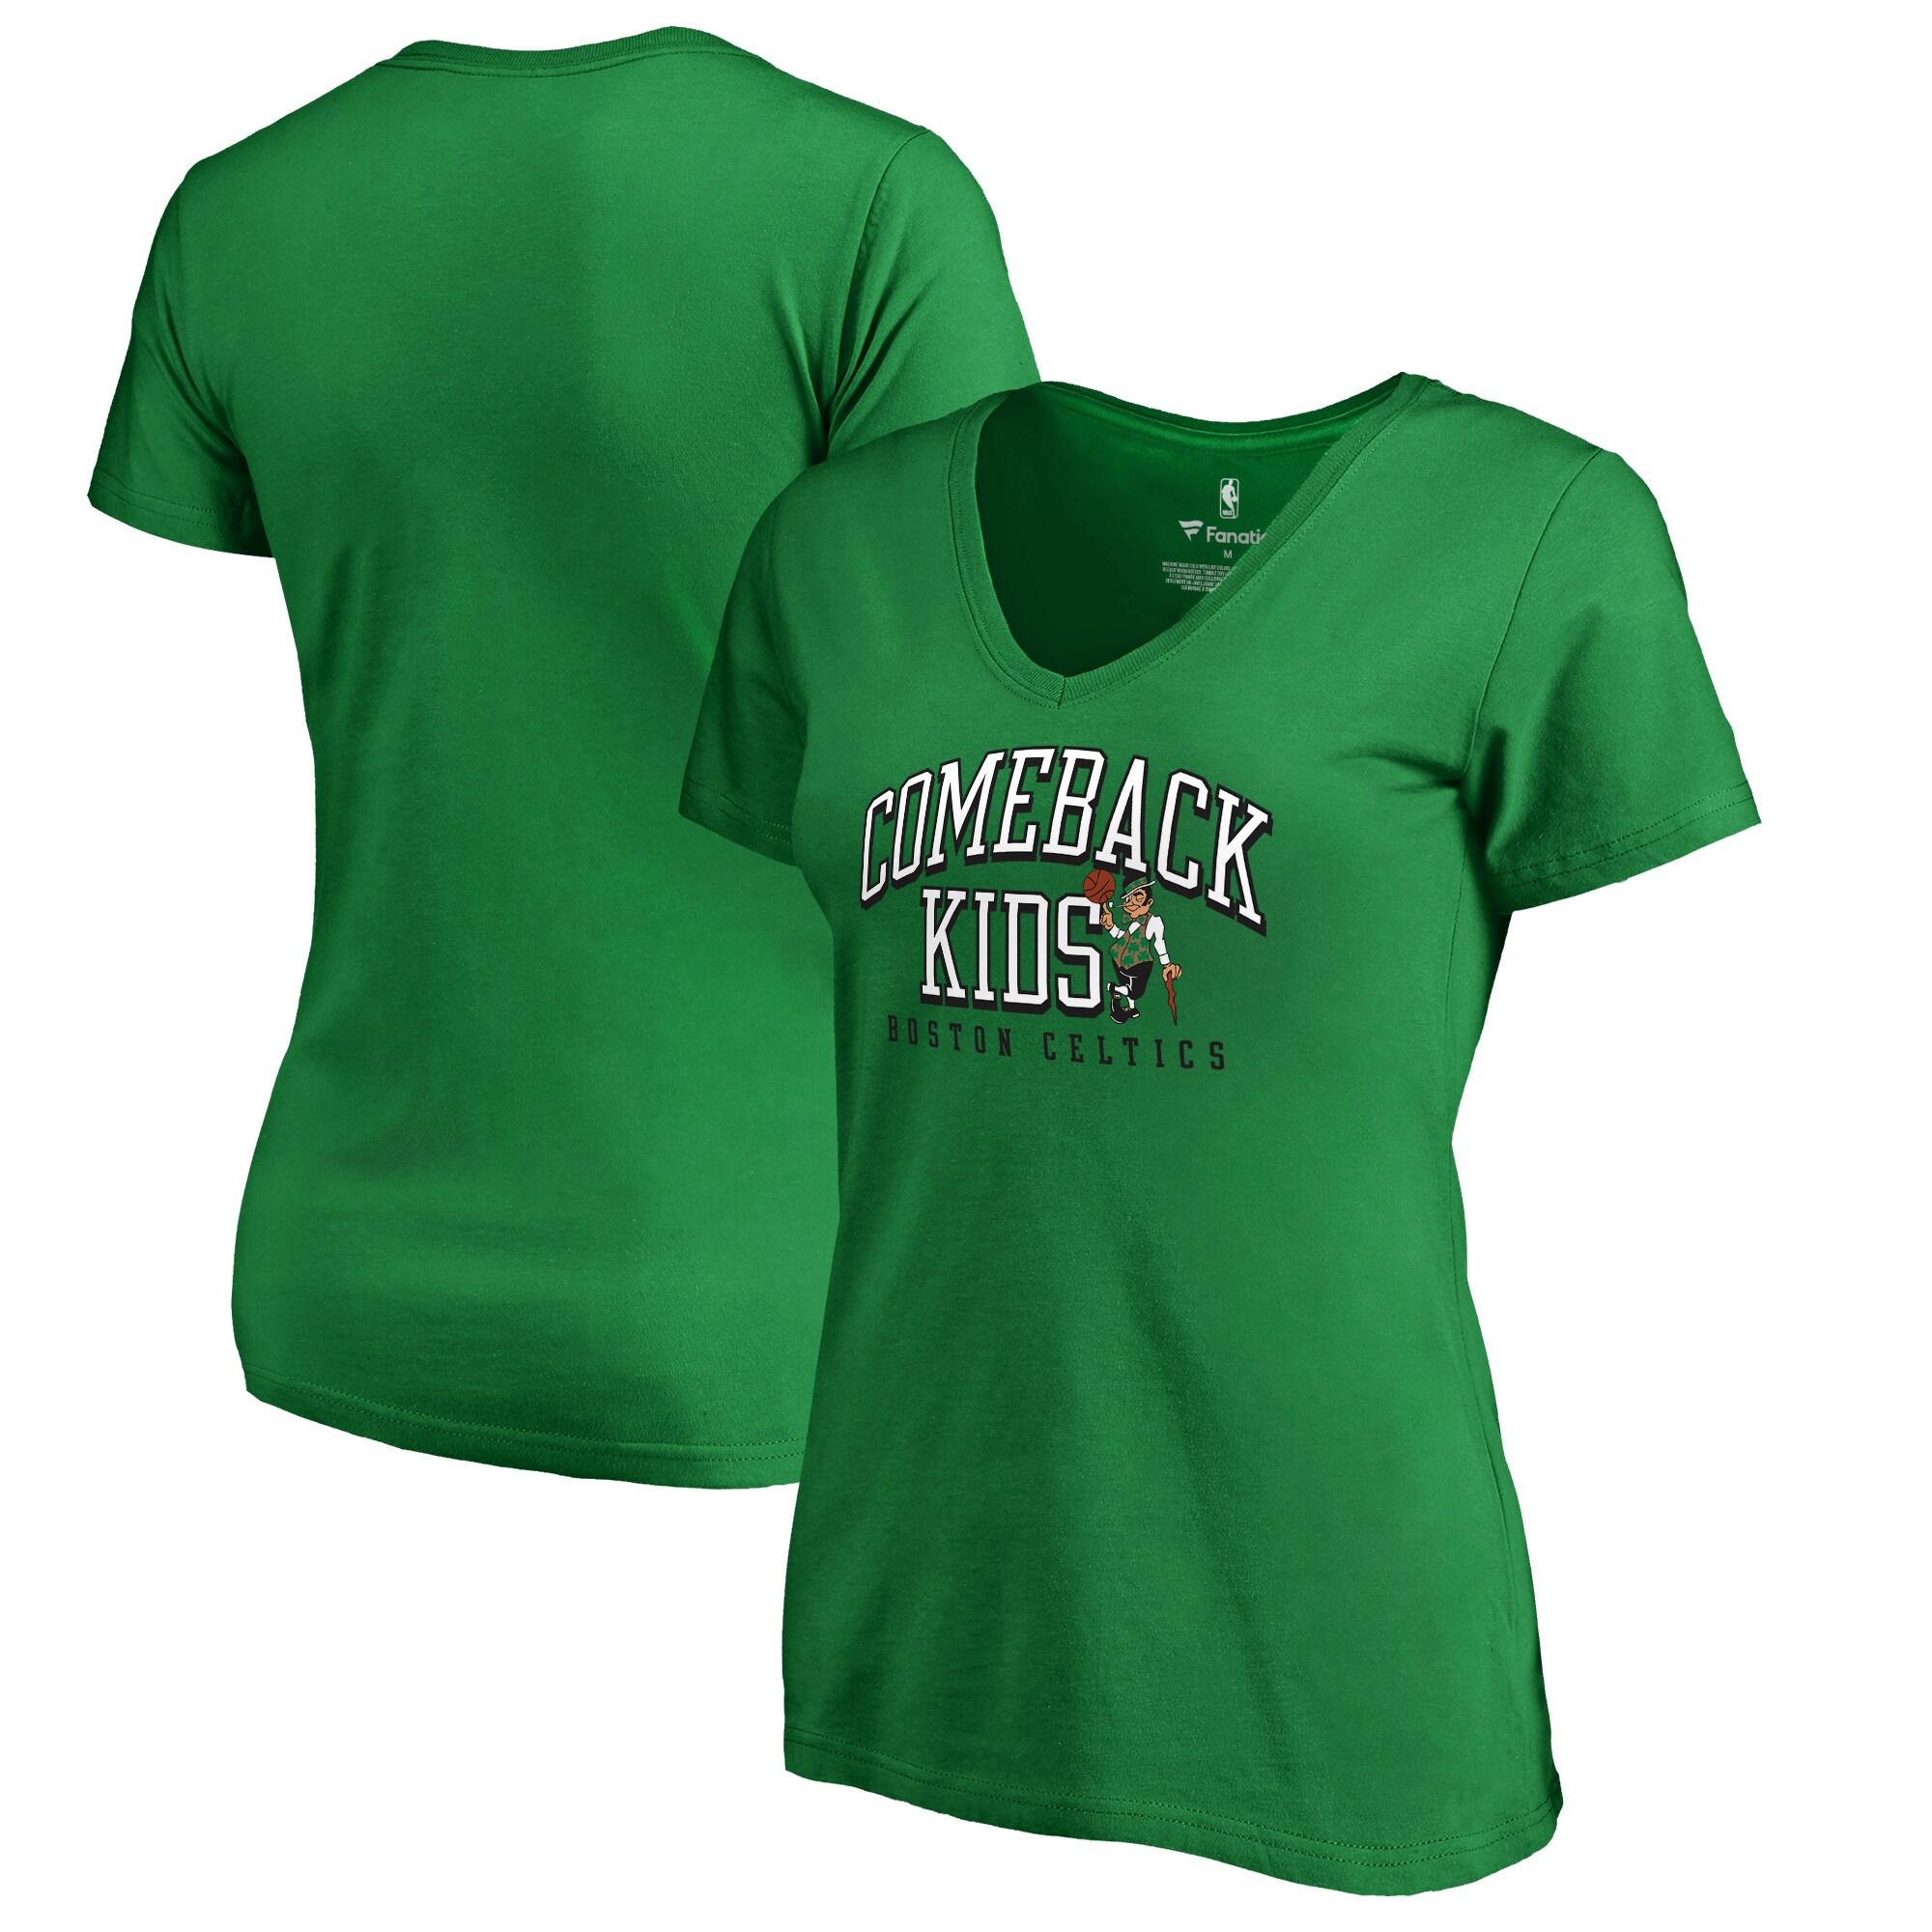 Boston Celtics Fanatics Branded Women's Comeback Kids V-Neck T-Shirt - Kelly Green